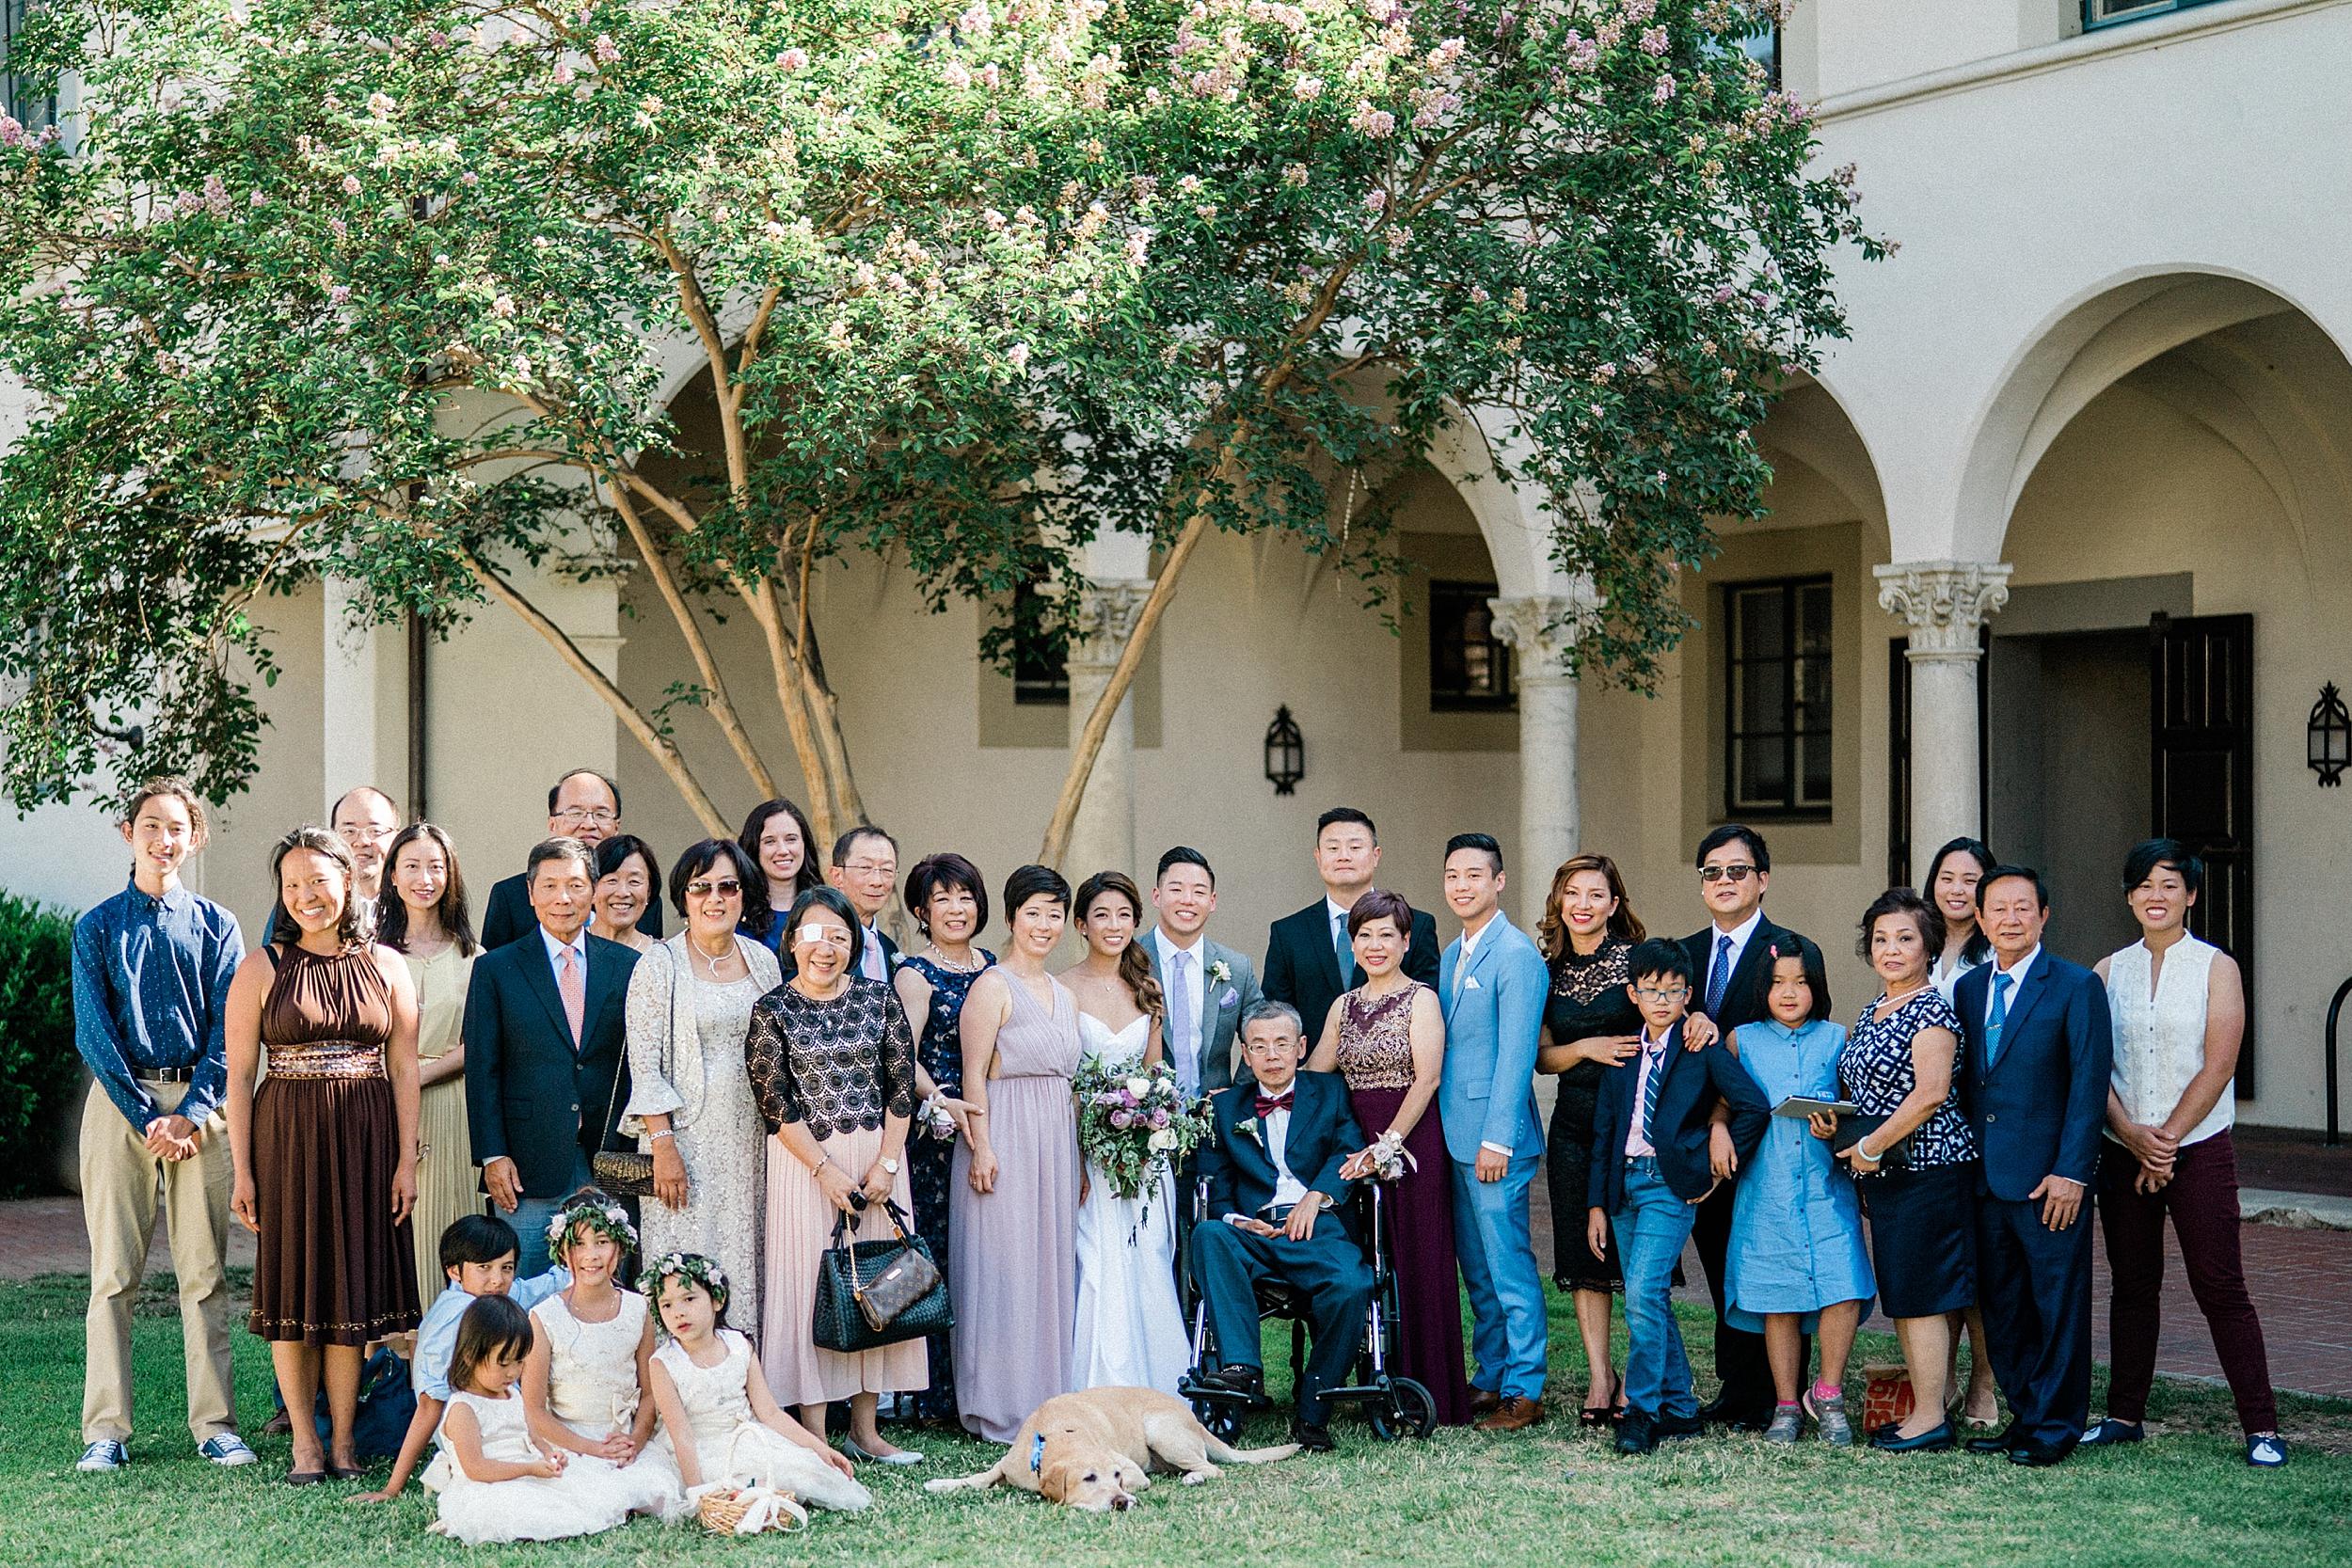 Caltech Wedding Stewart and Connie Photography_0014.jpg